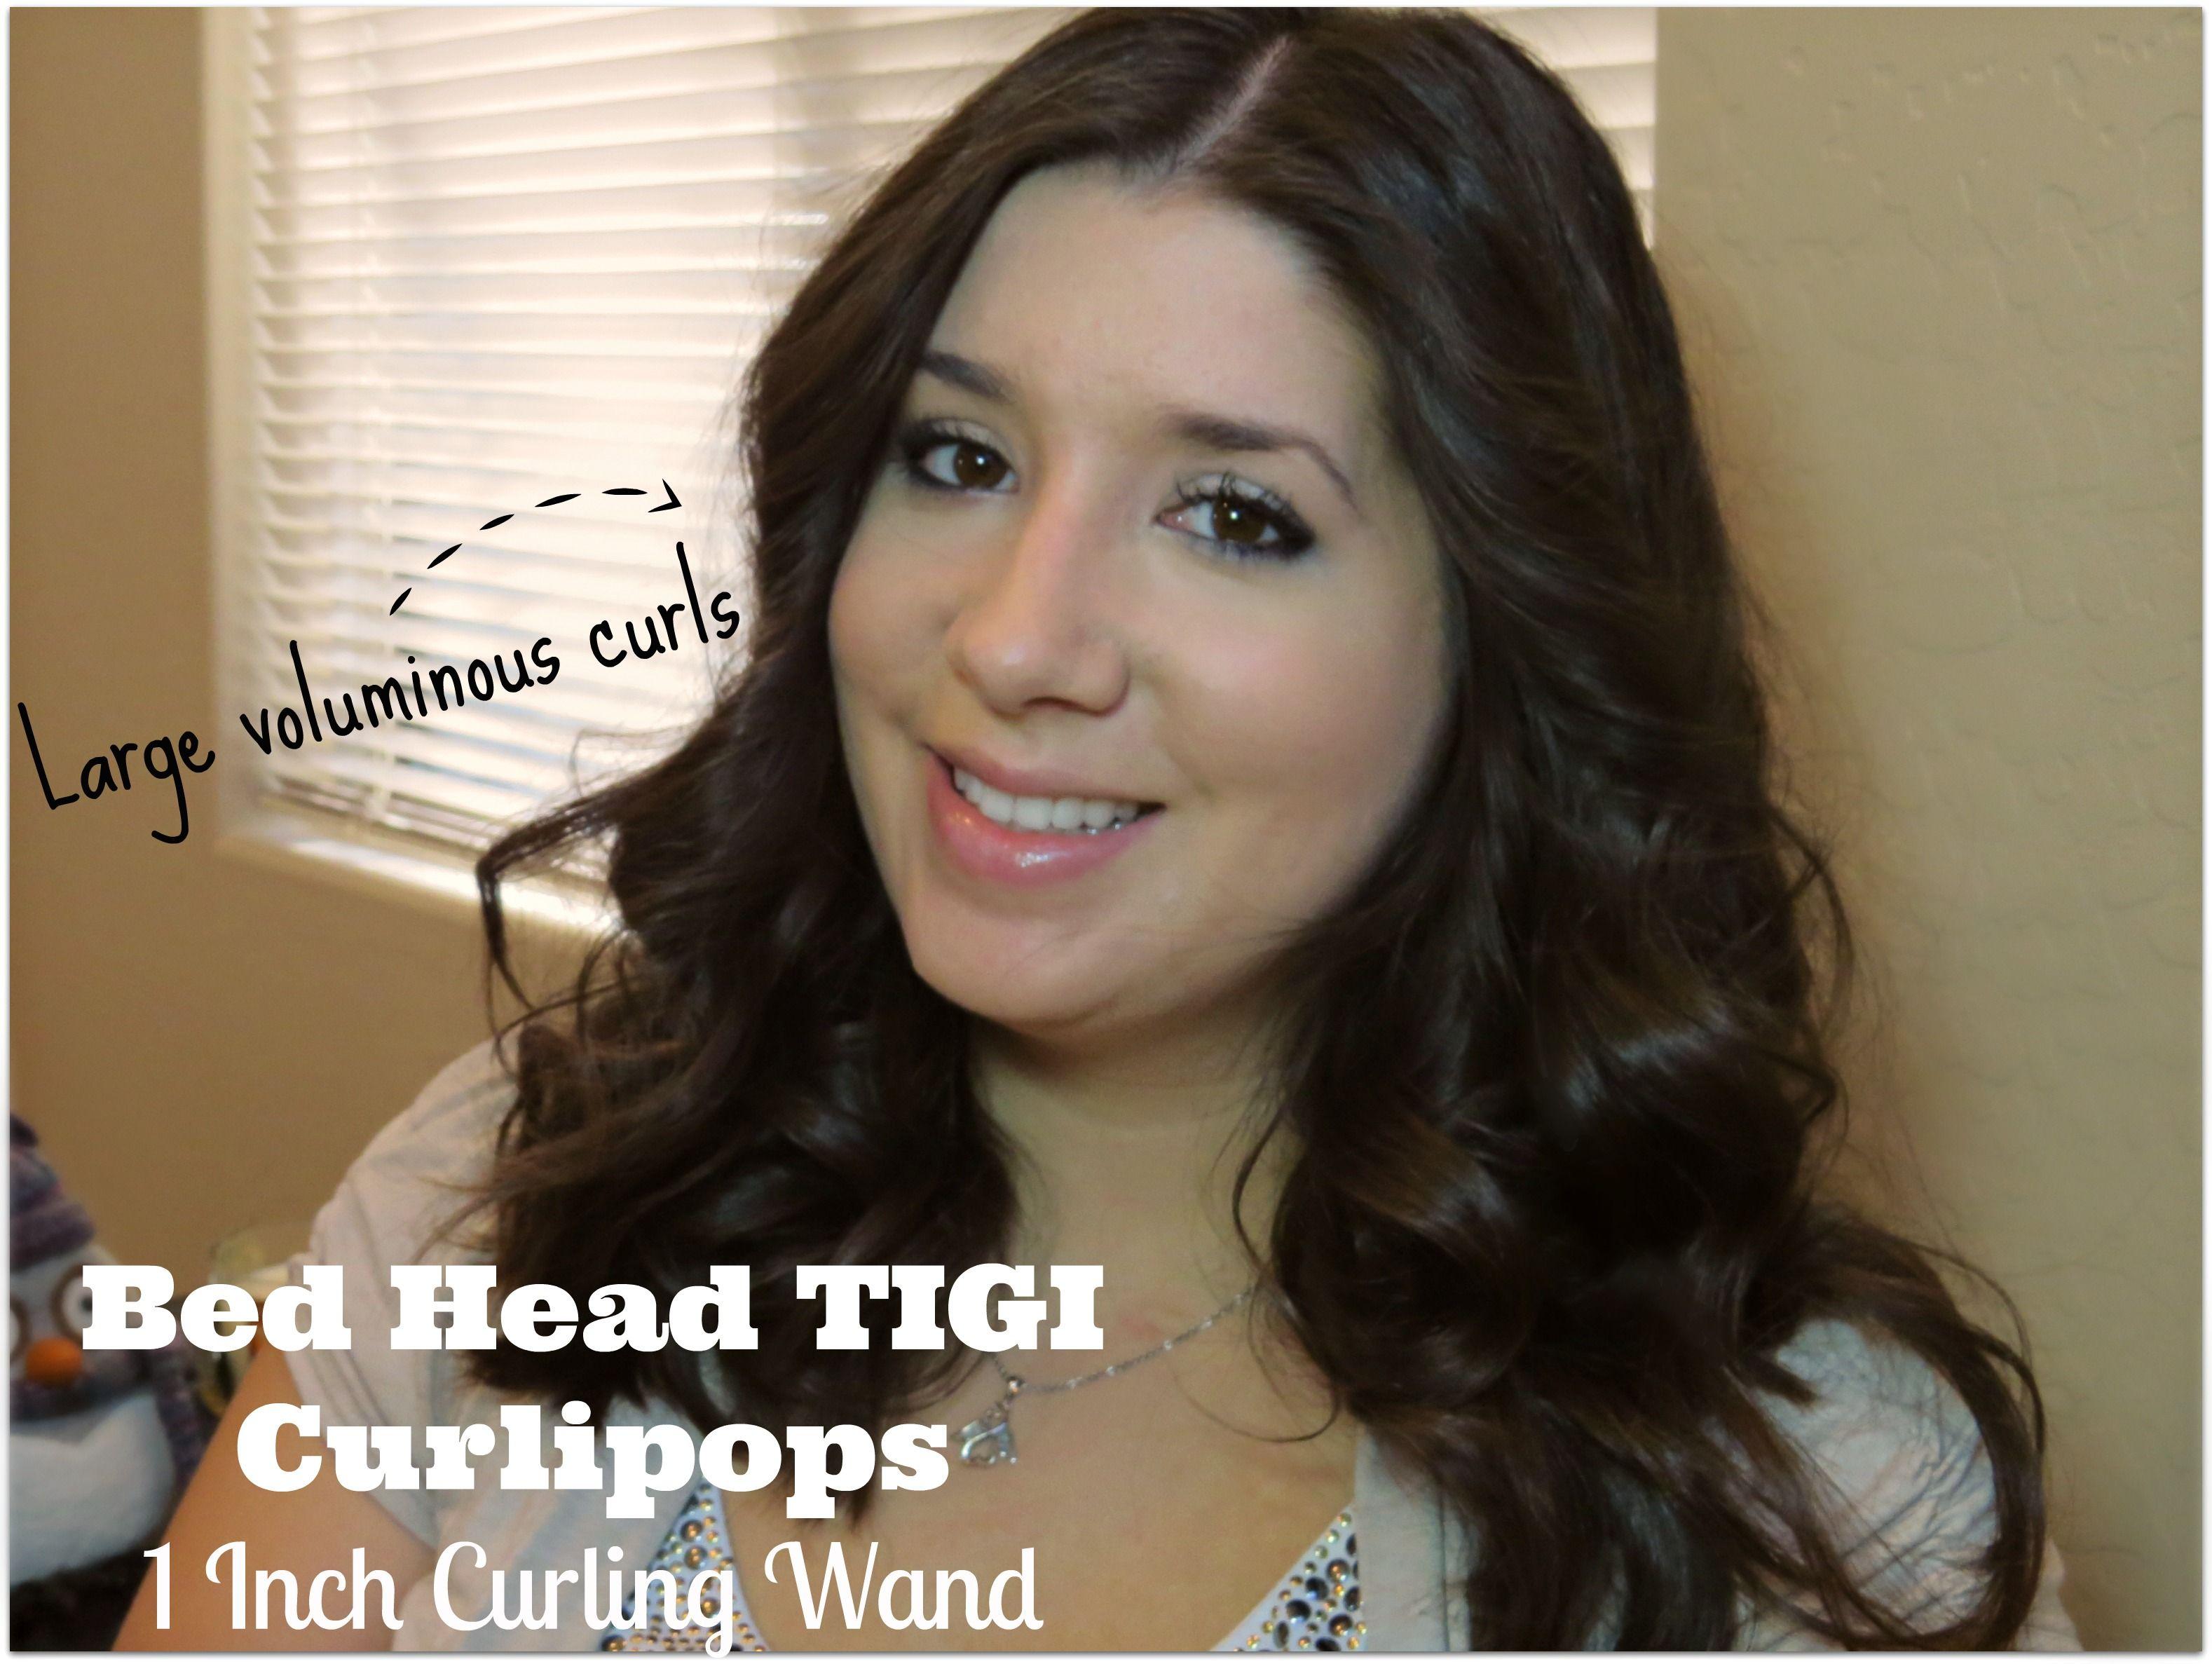 Bed Head Tigi Curlipops 1 Inch Curling Wand Review